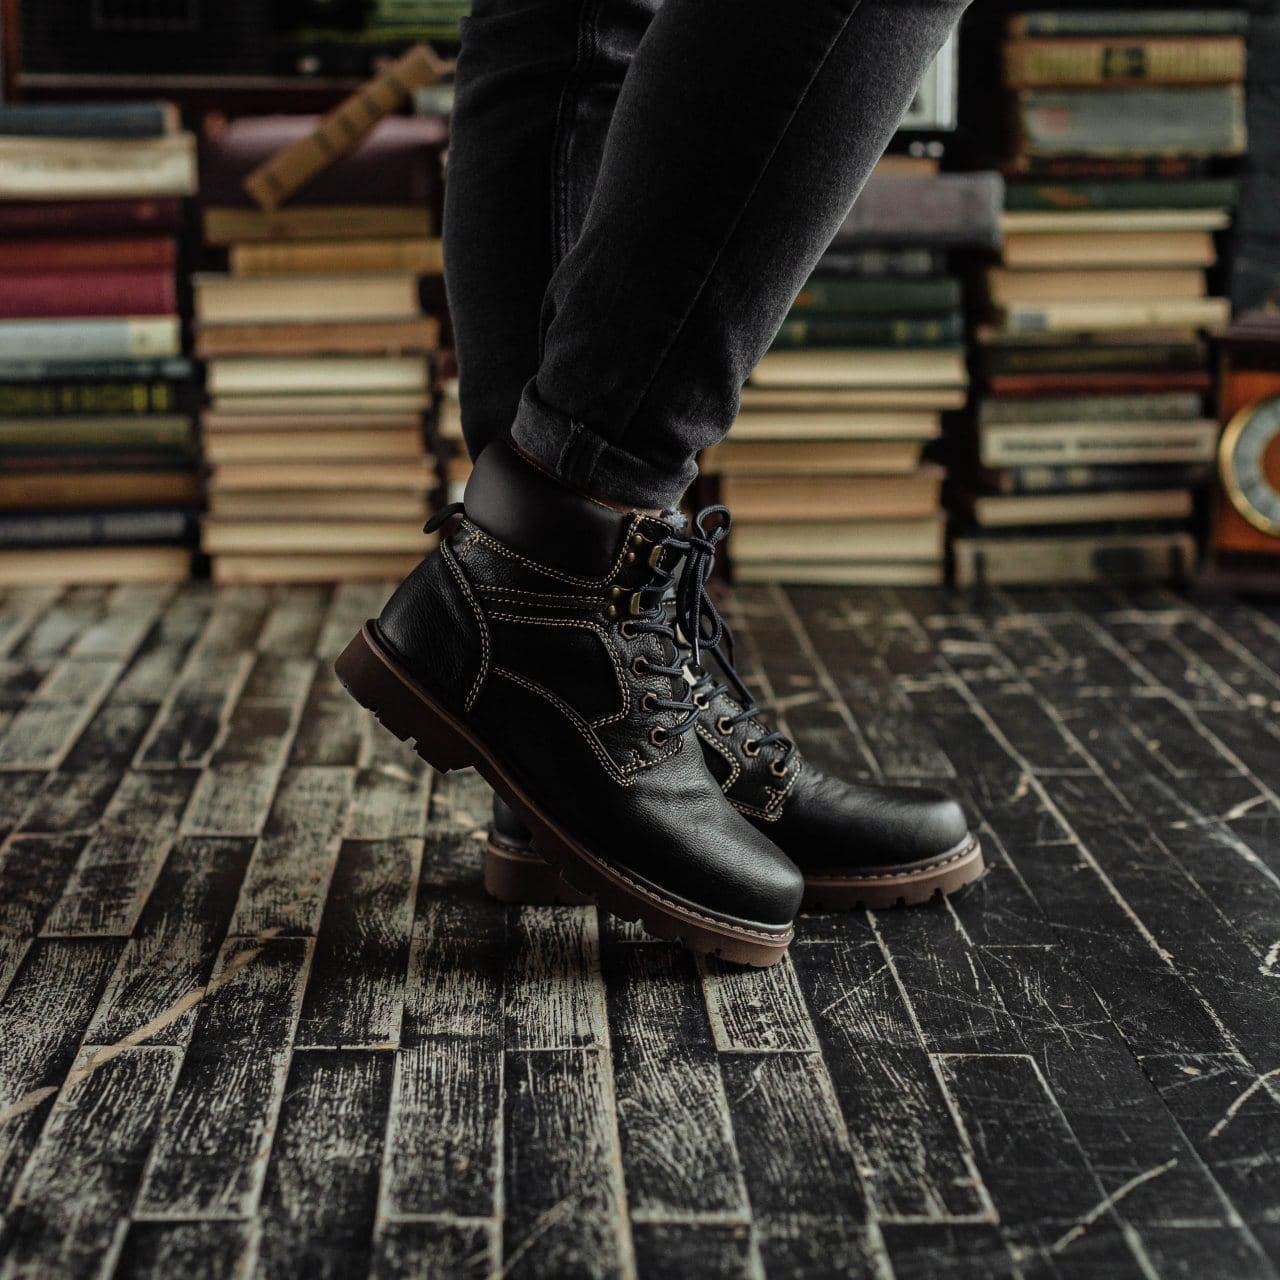 Ботинки South Graft black - фото 4